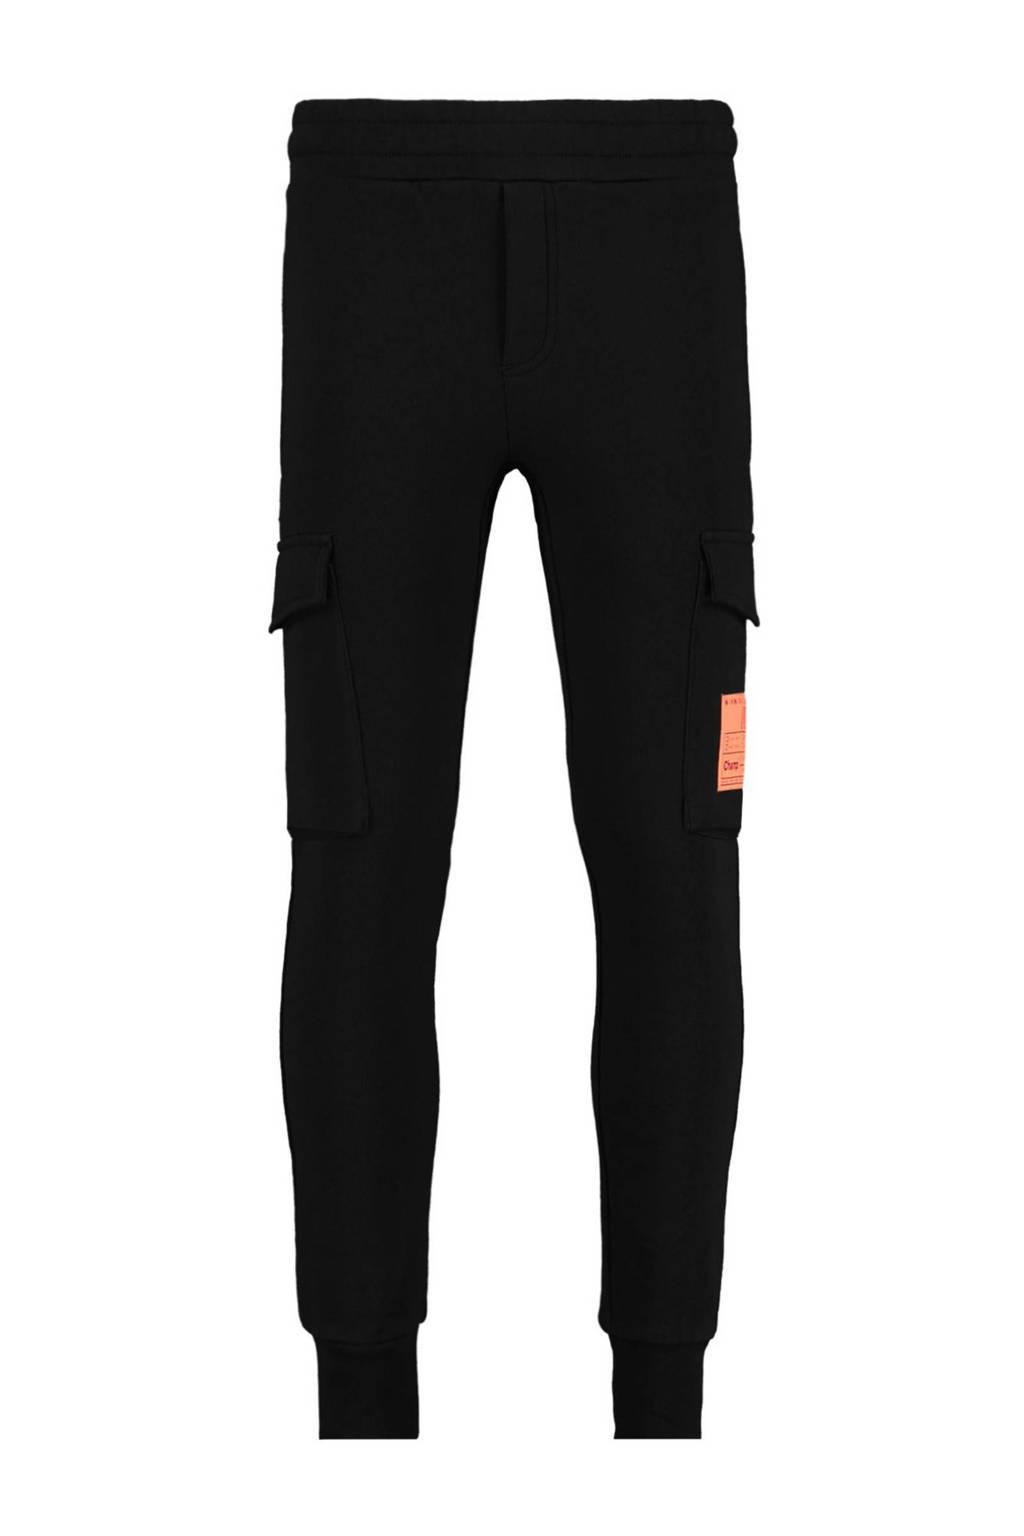 CoolCat Junior joggingbroek Colt zwart, Zwart